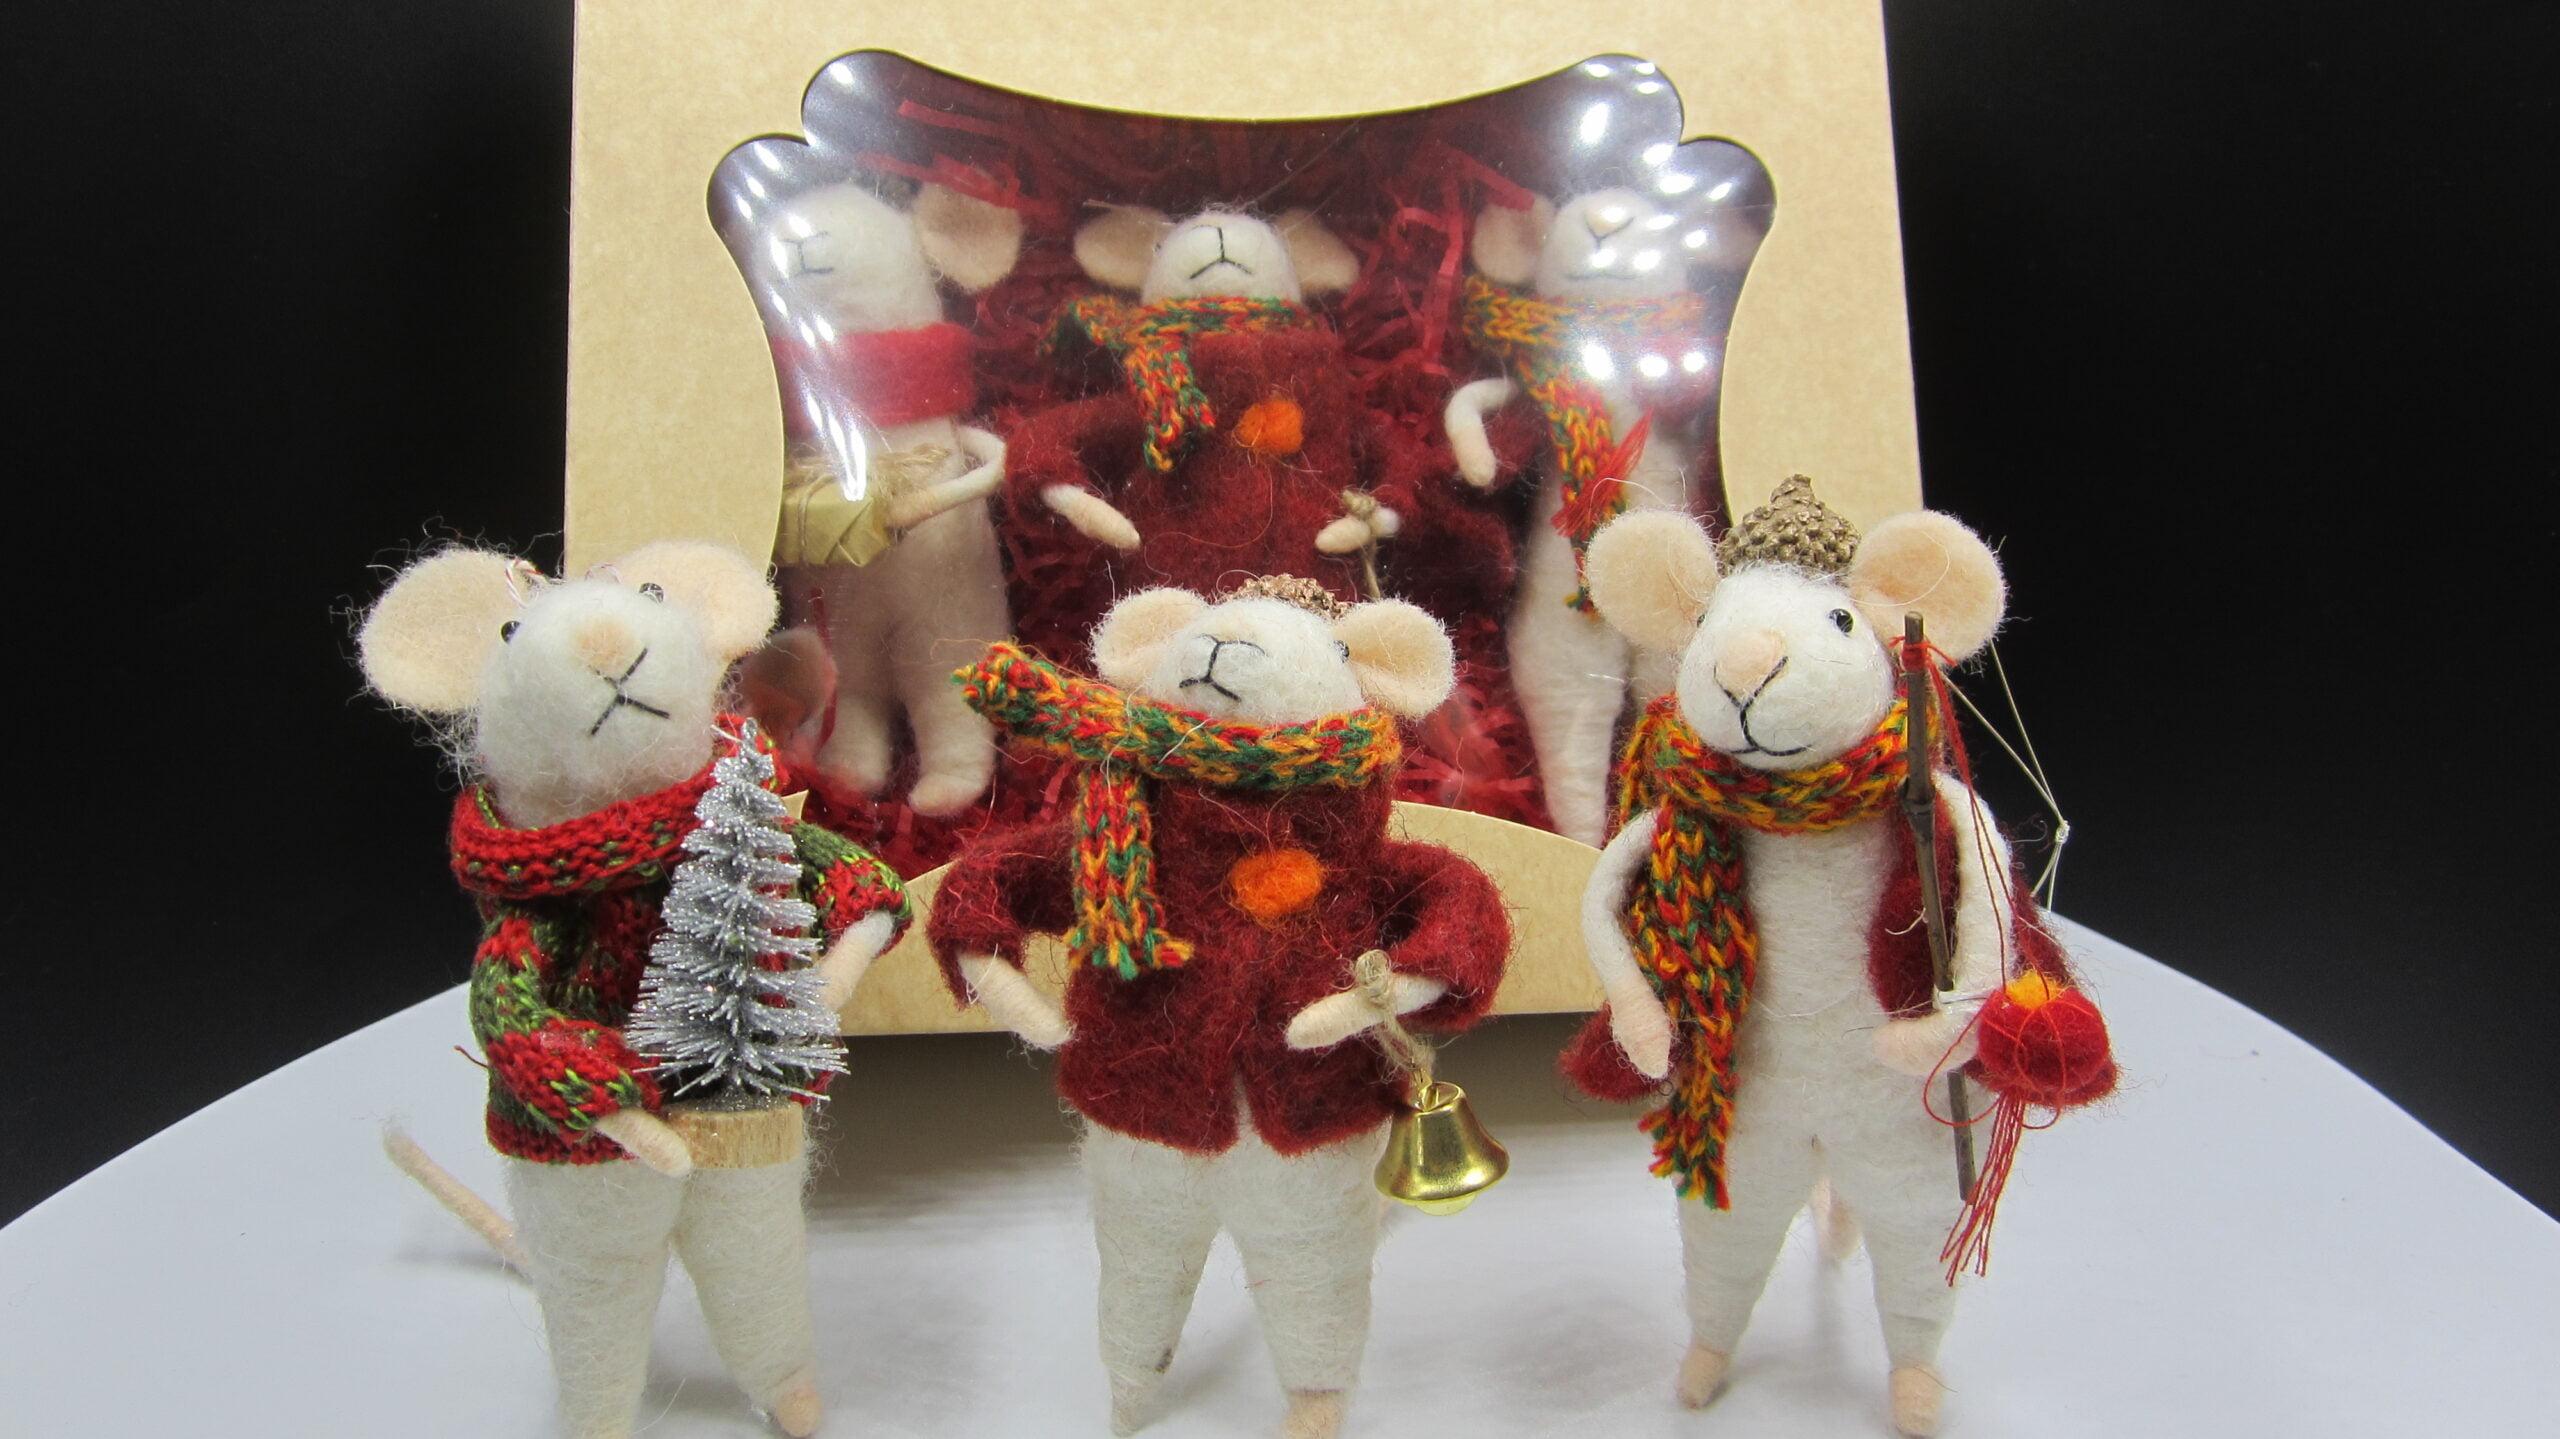 Box of festive felt Christmas mice